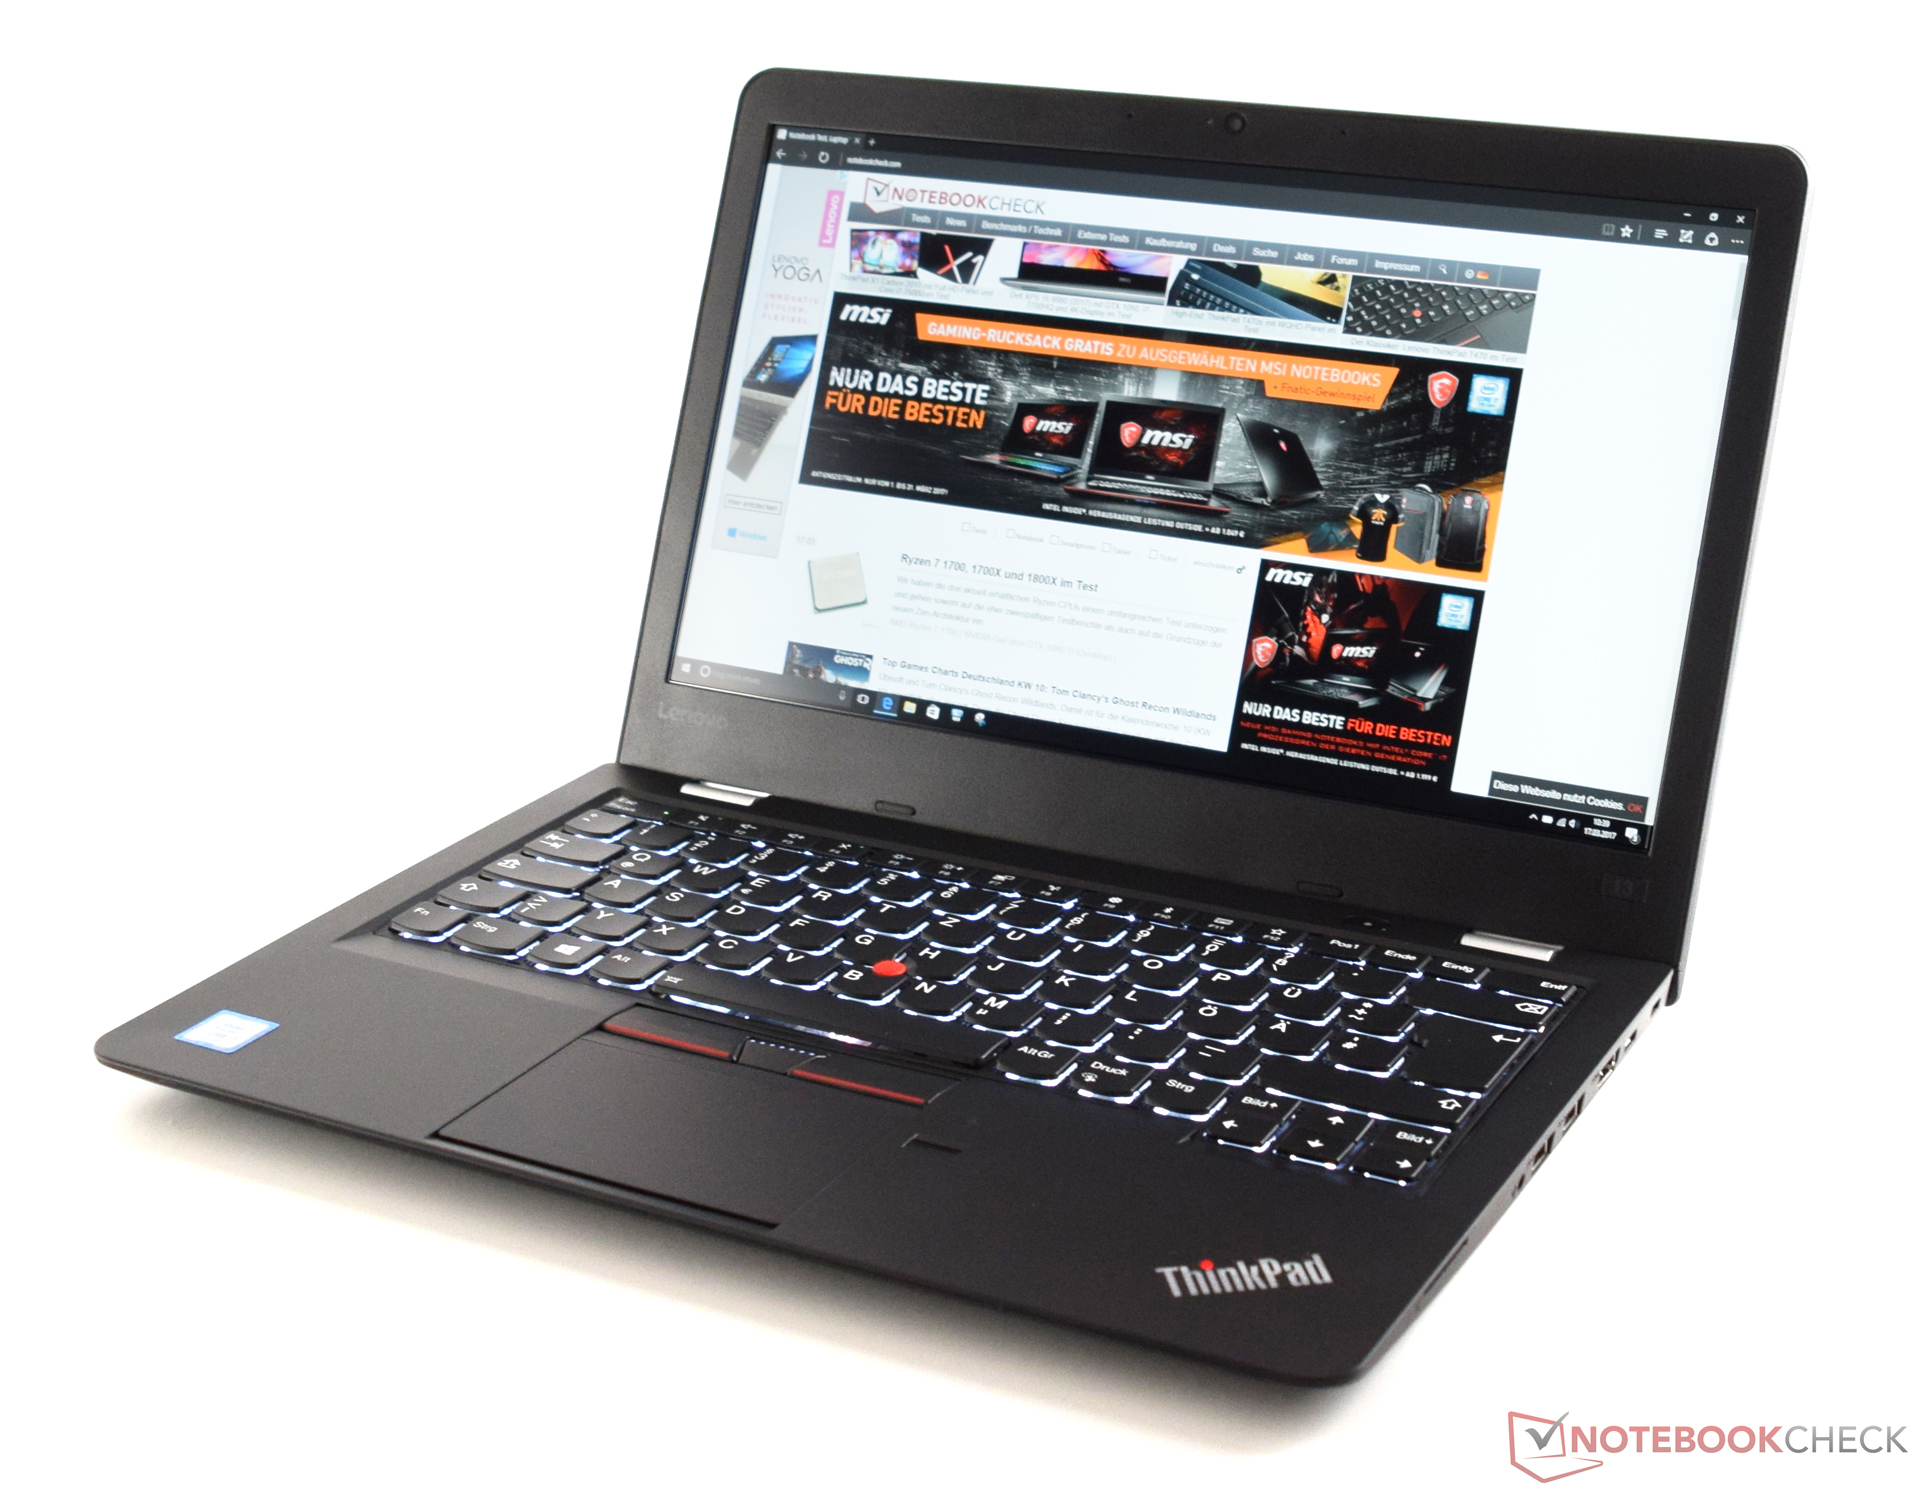 Lenovo ThinkPad 13 2017 (Core i7, Full-HD) Laptop Review